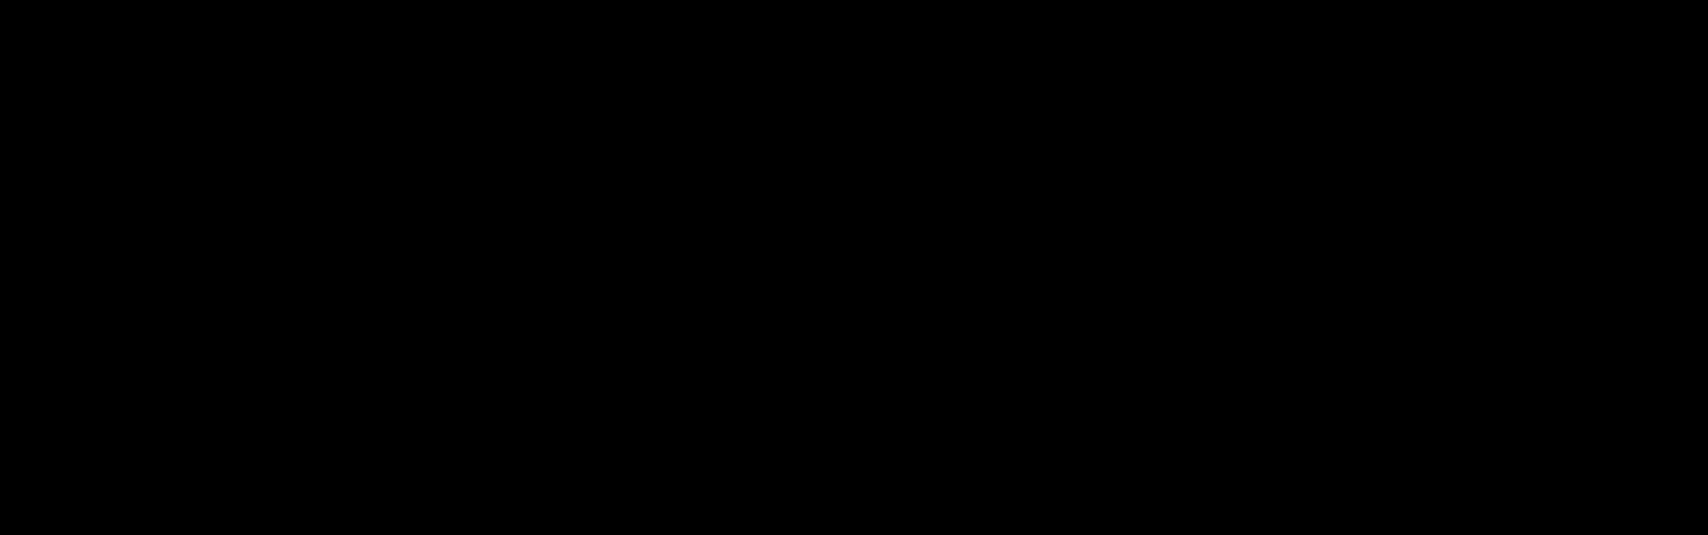 Indoxyl β-D-glucuronide cyclohexylammonium salt